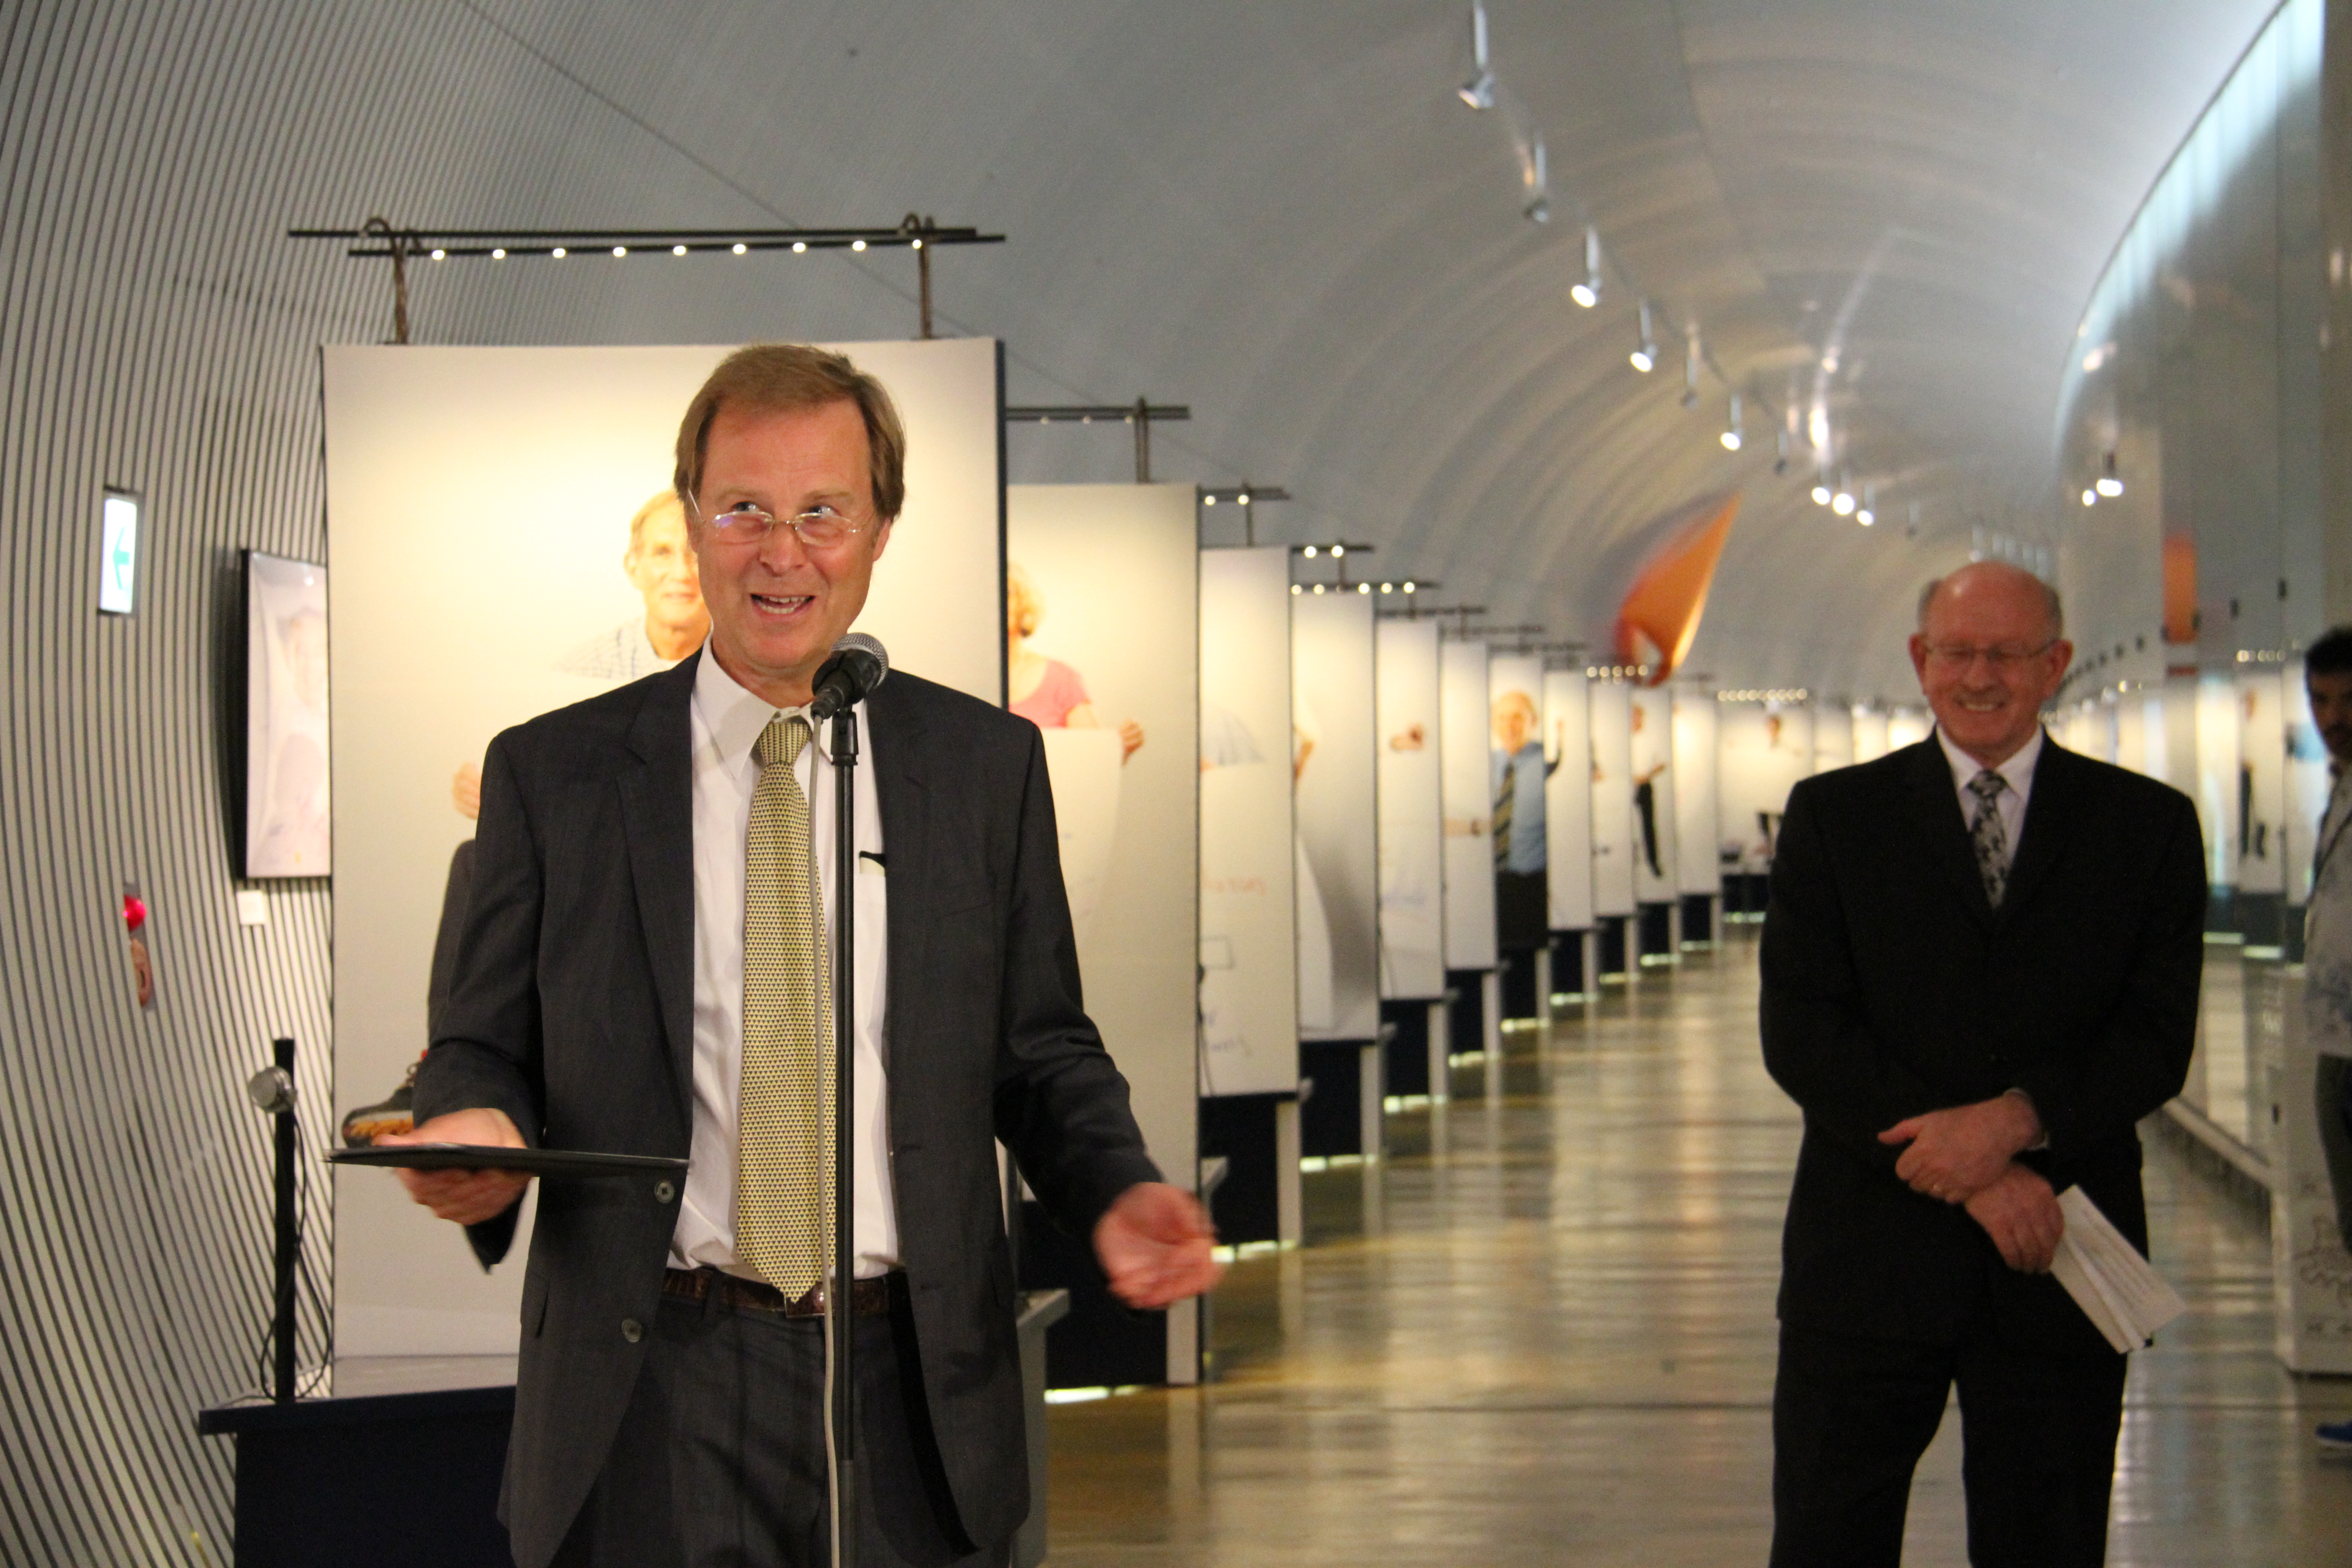 Director of the Nobel Museum Olov Amelin